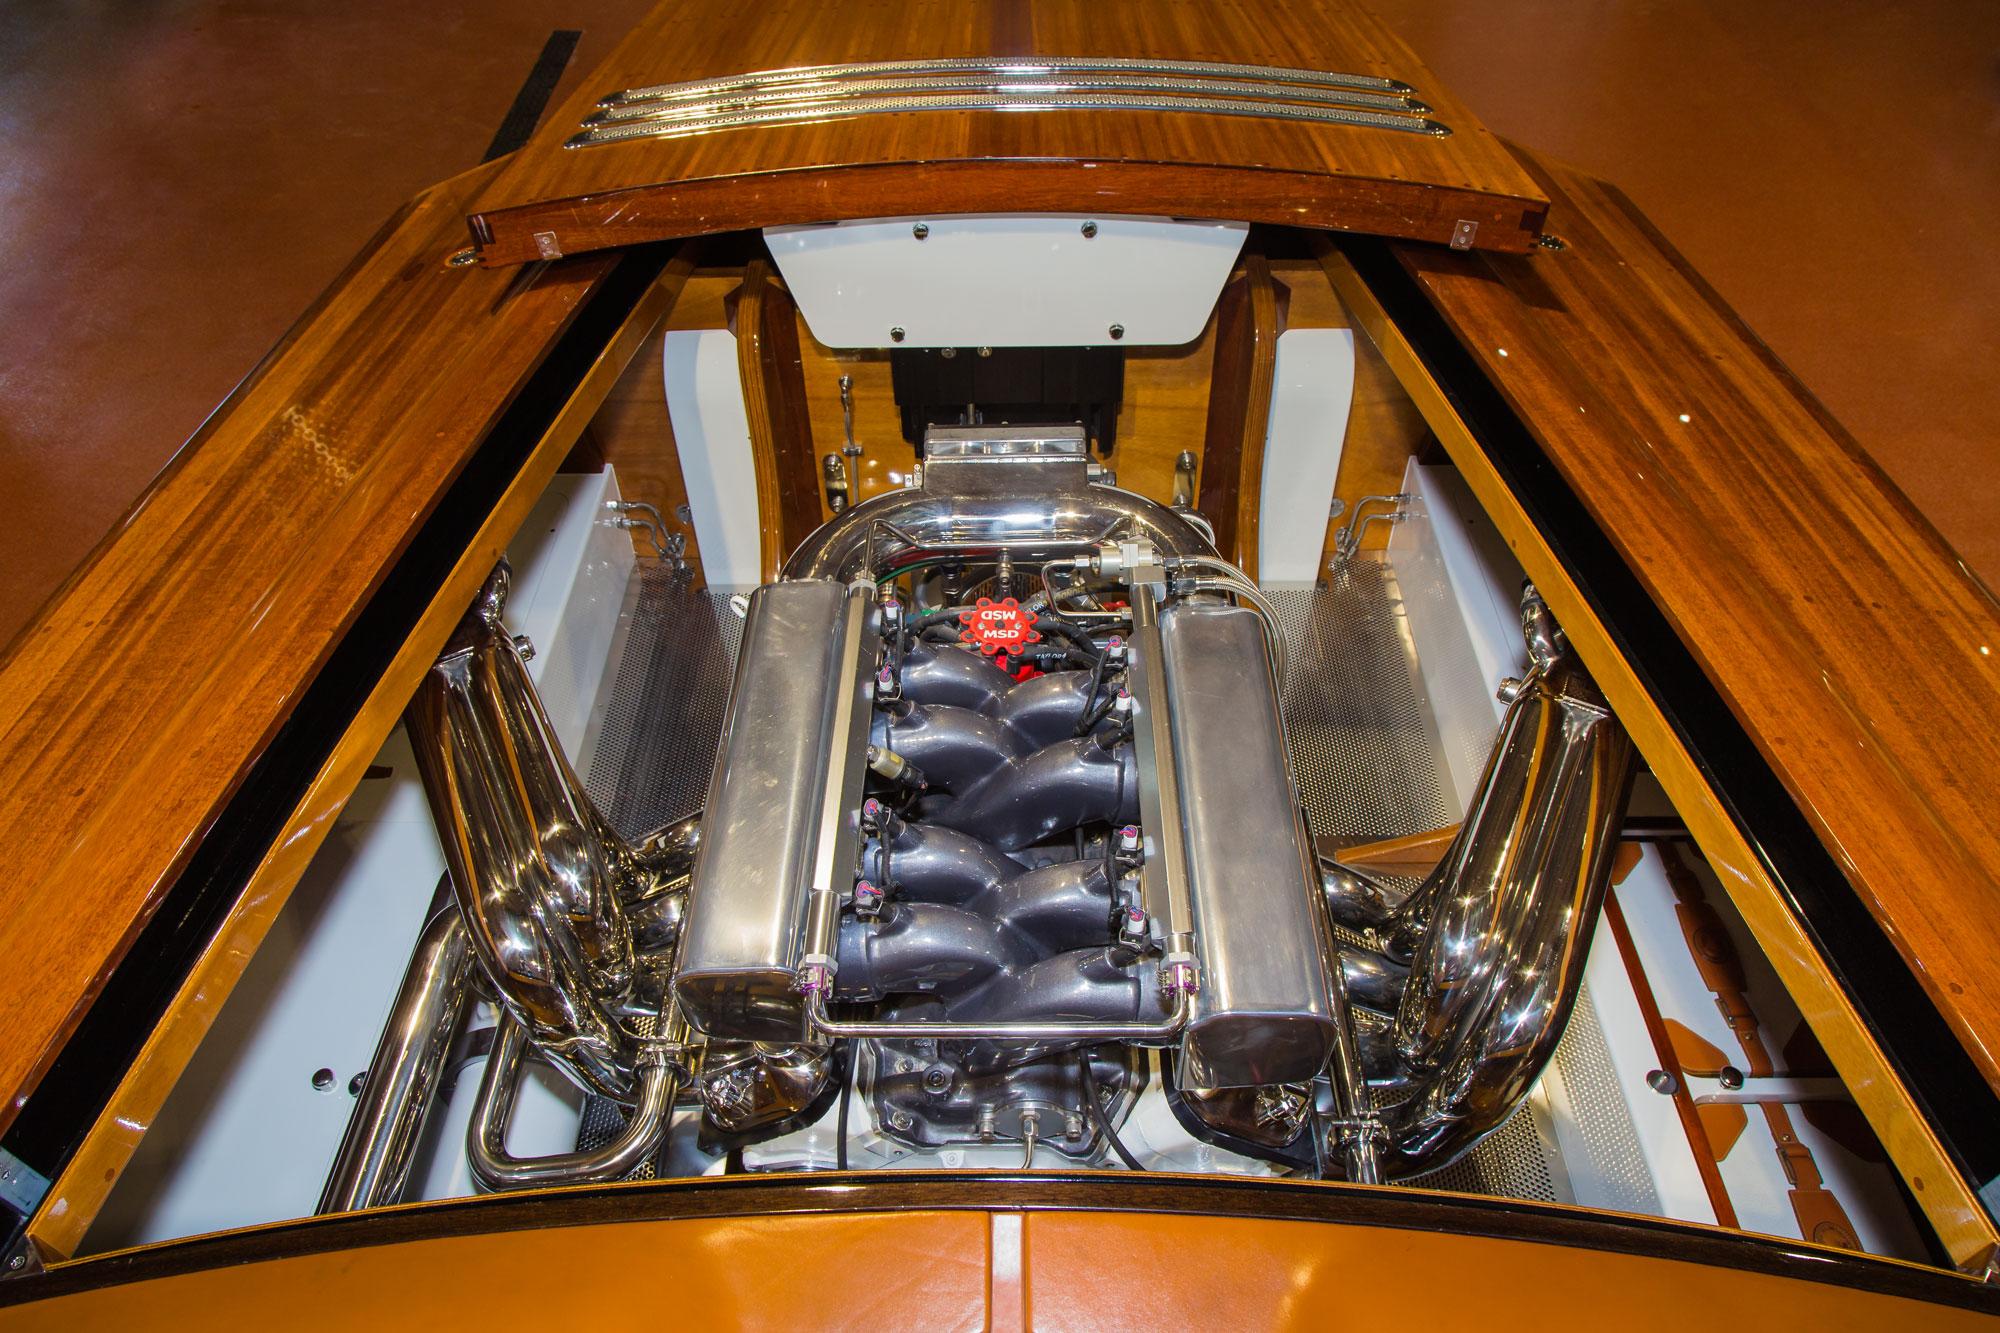 Alpha Z 805 hp V8 engine